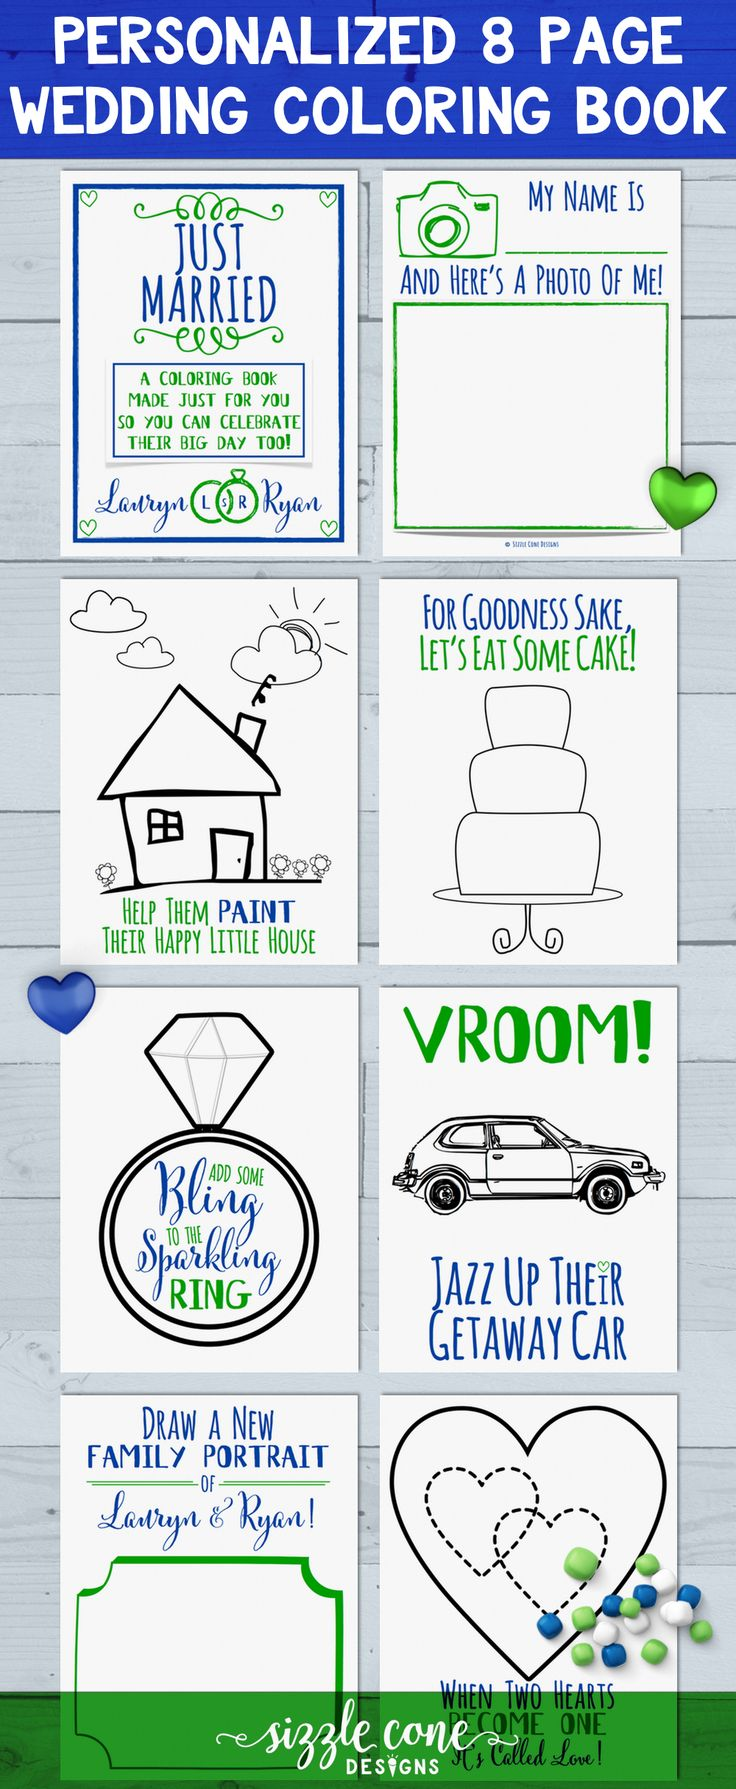 17 Best Ideas About Kids Table Wedding On Pinterest